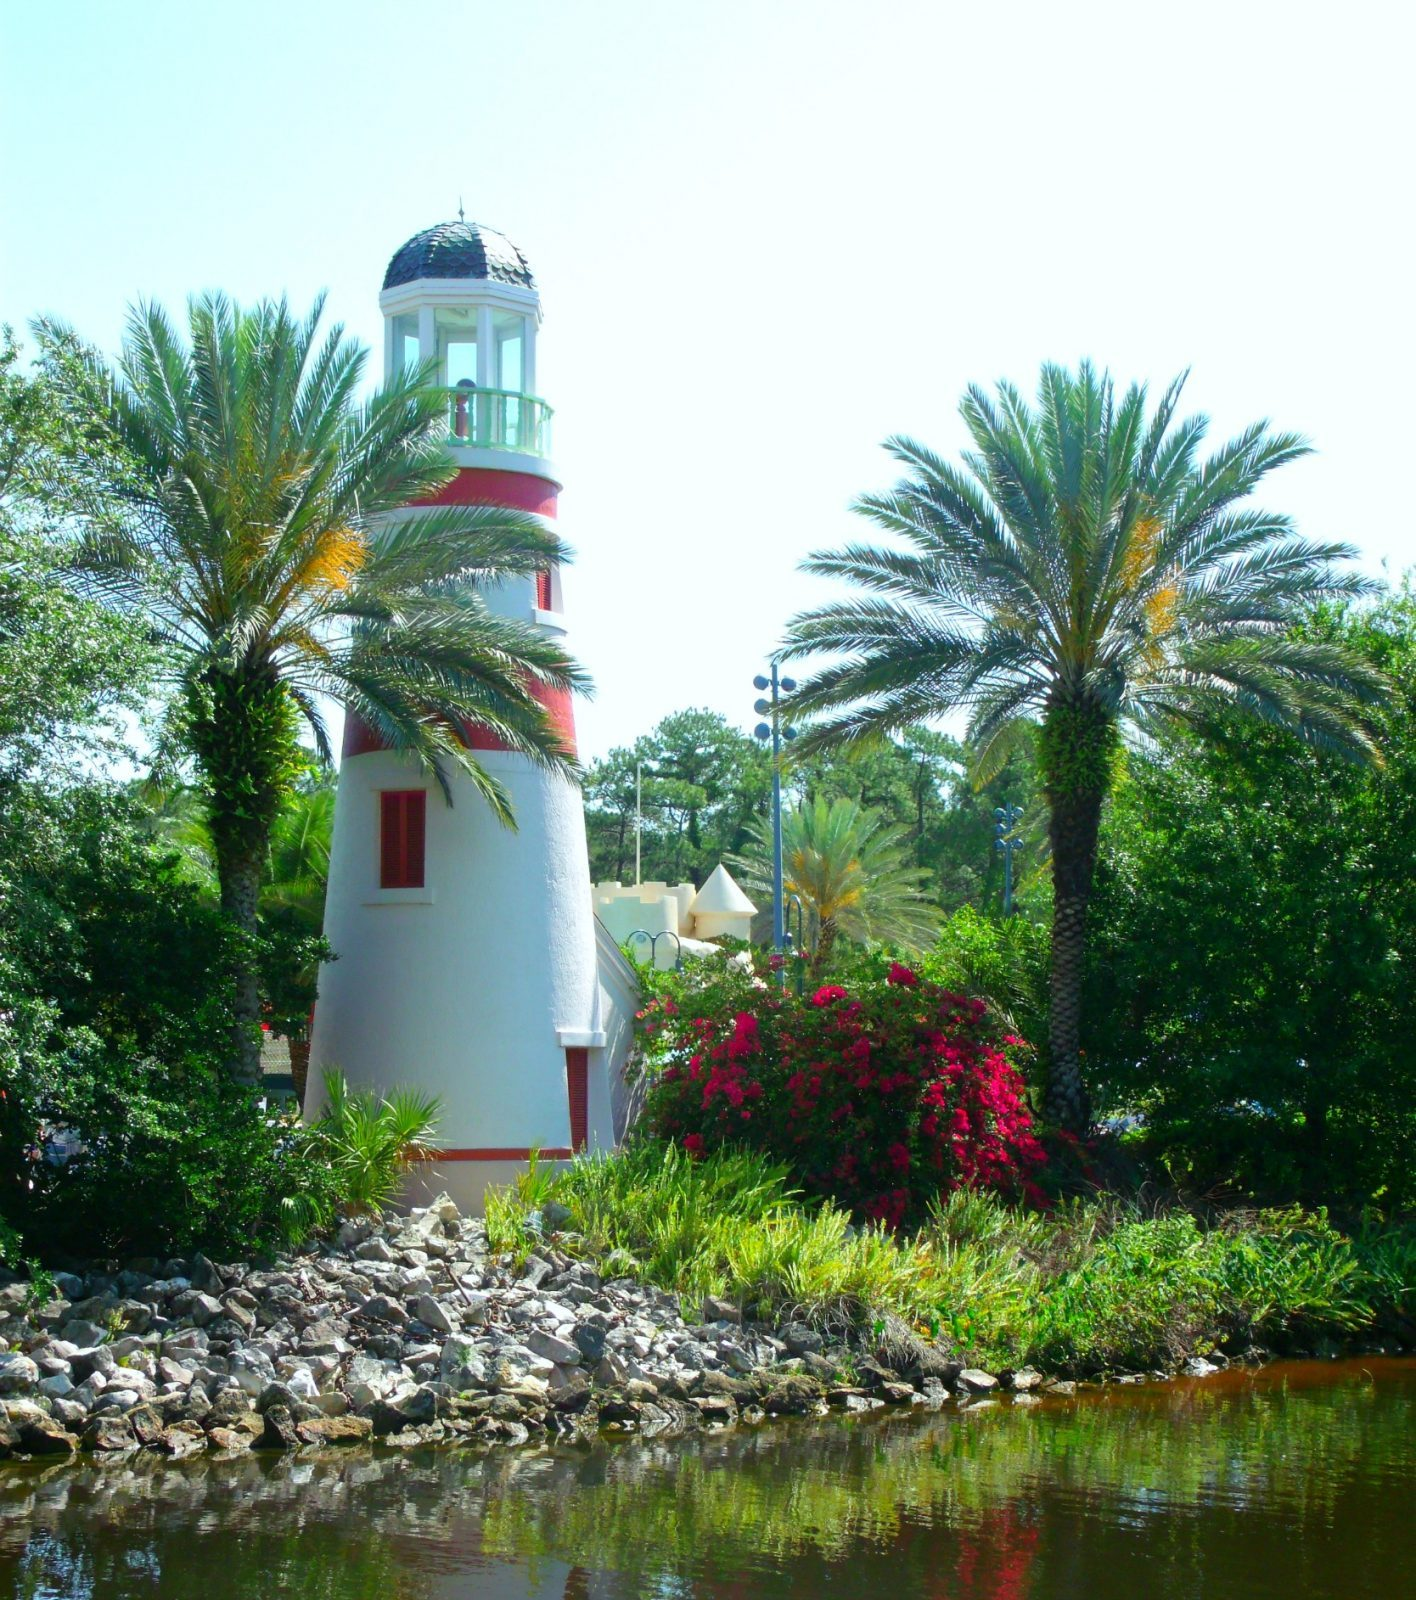 lighthouse at Disney's Old Key West Resort